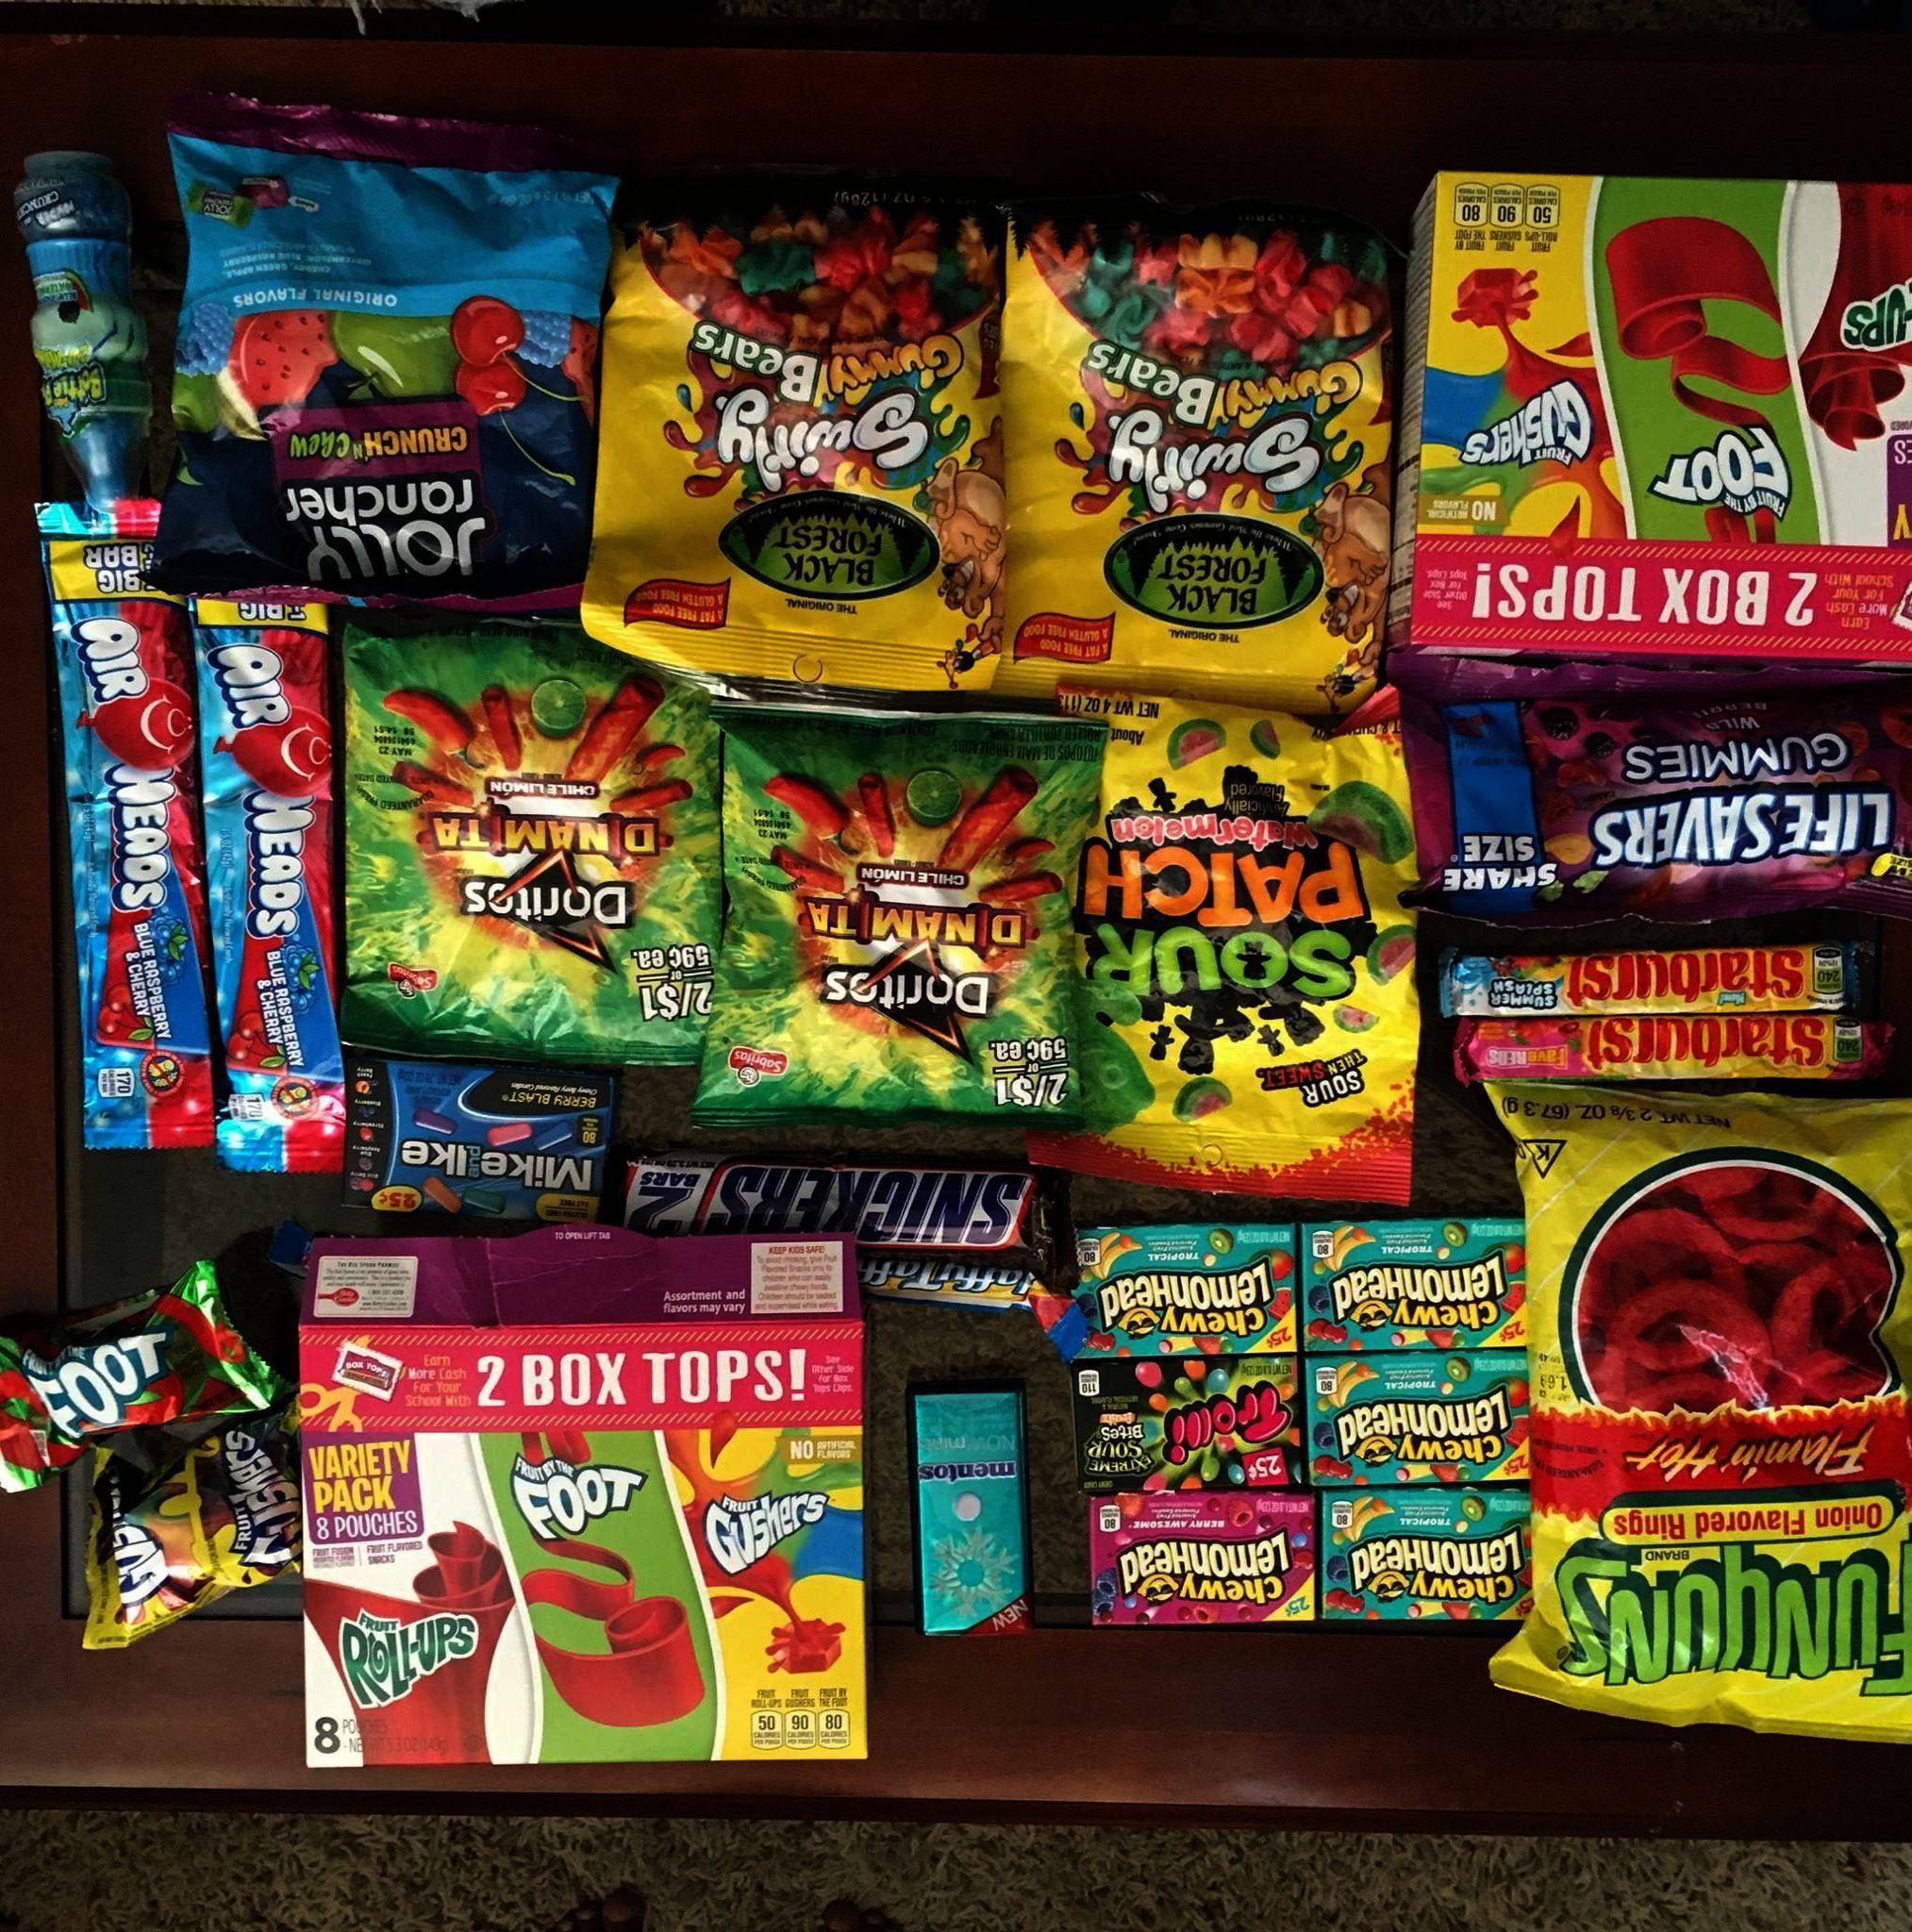 Junk food snacks for road trips despite healthiest snack